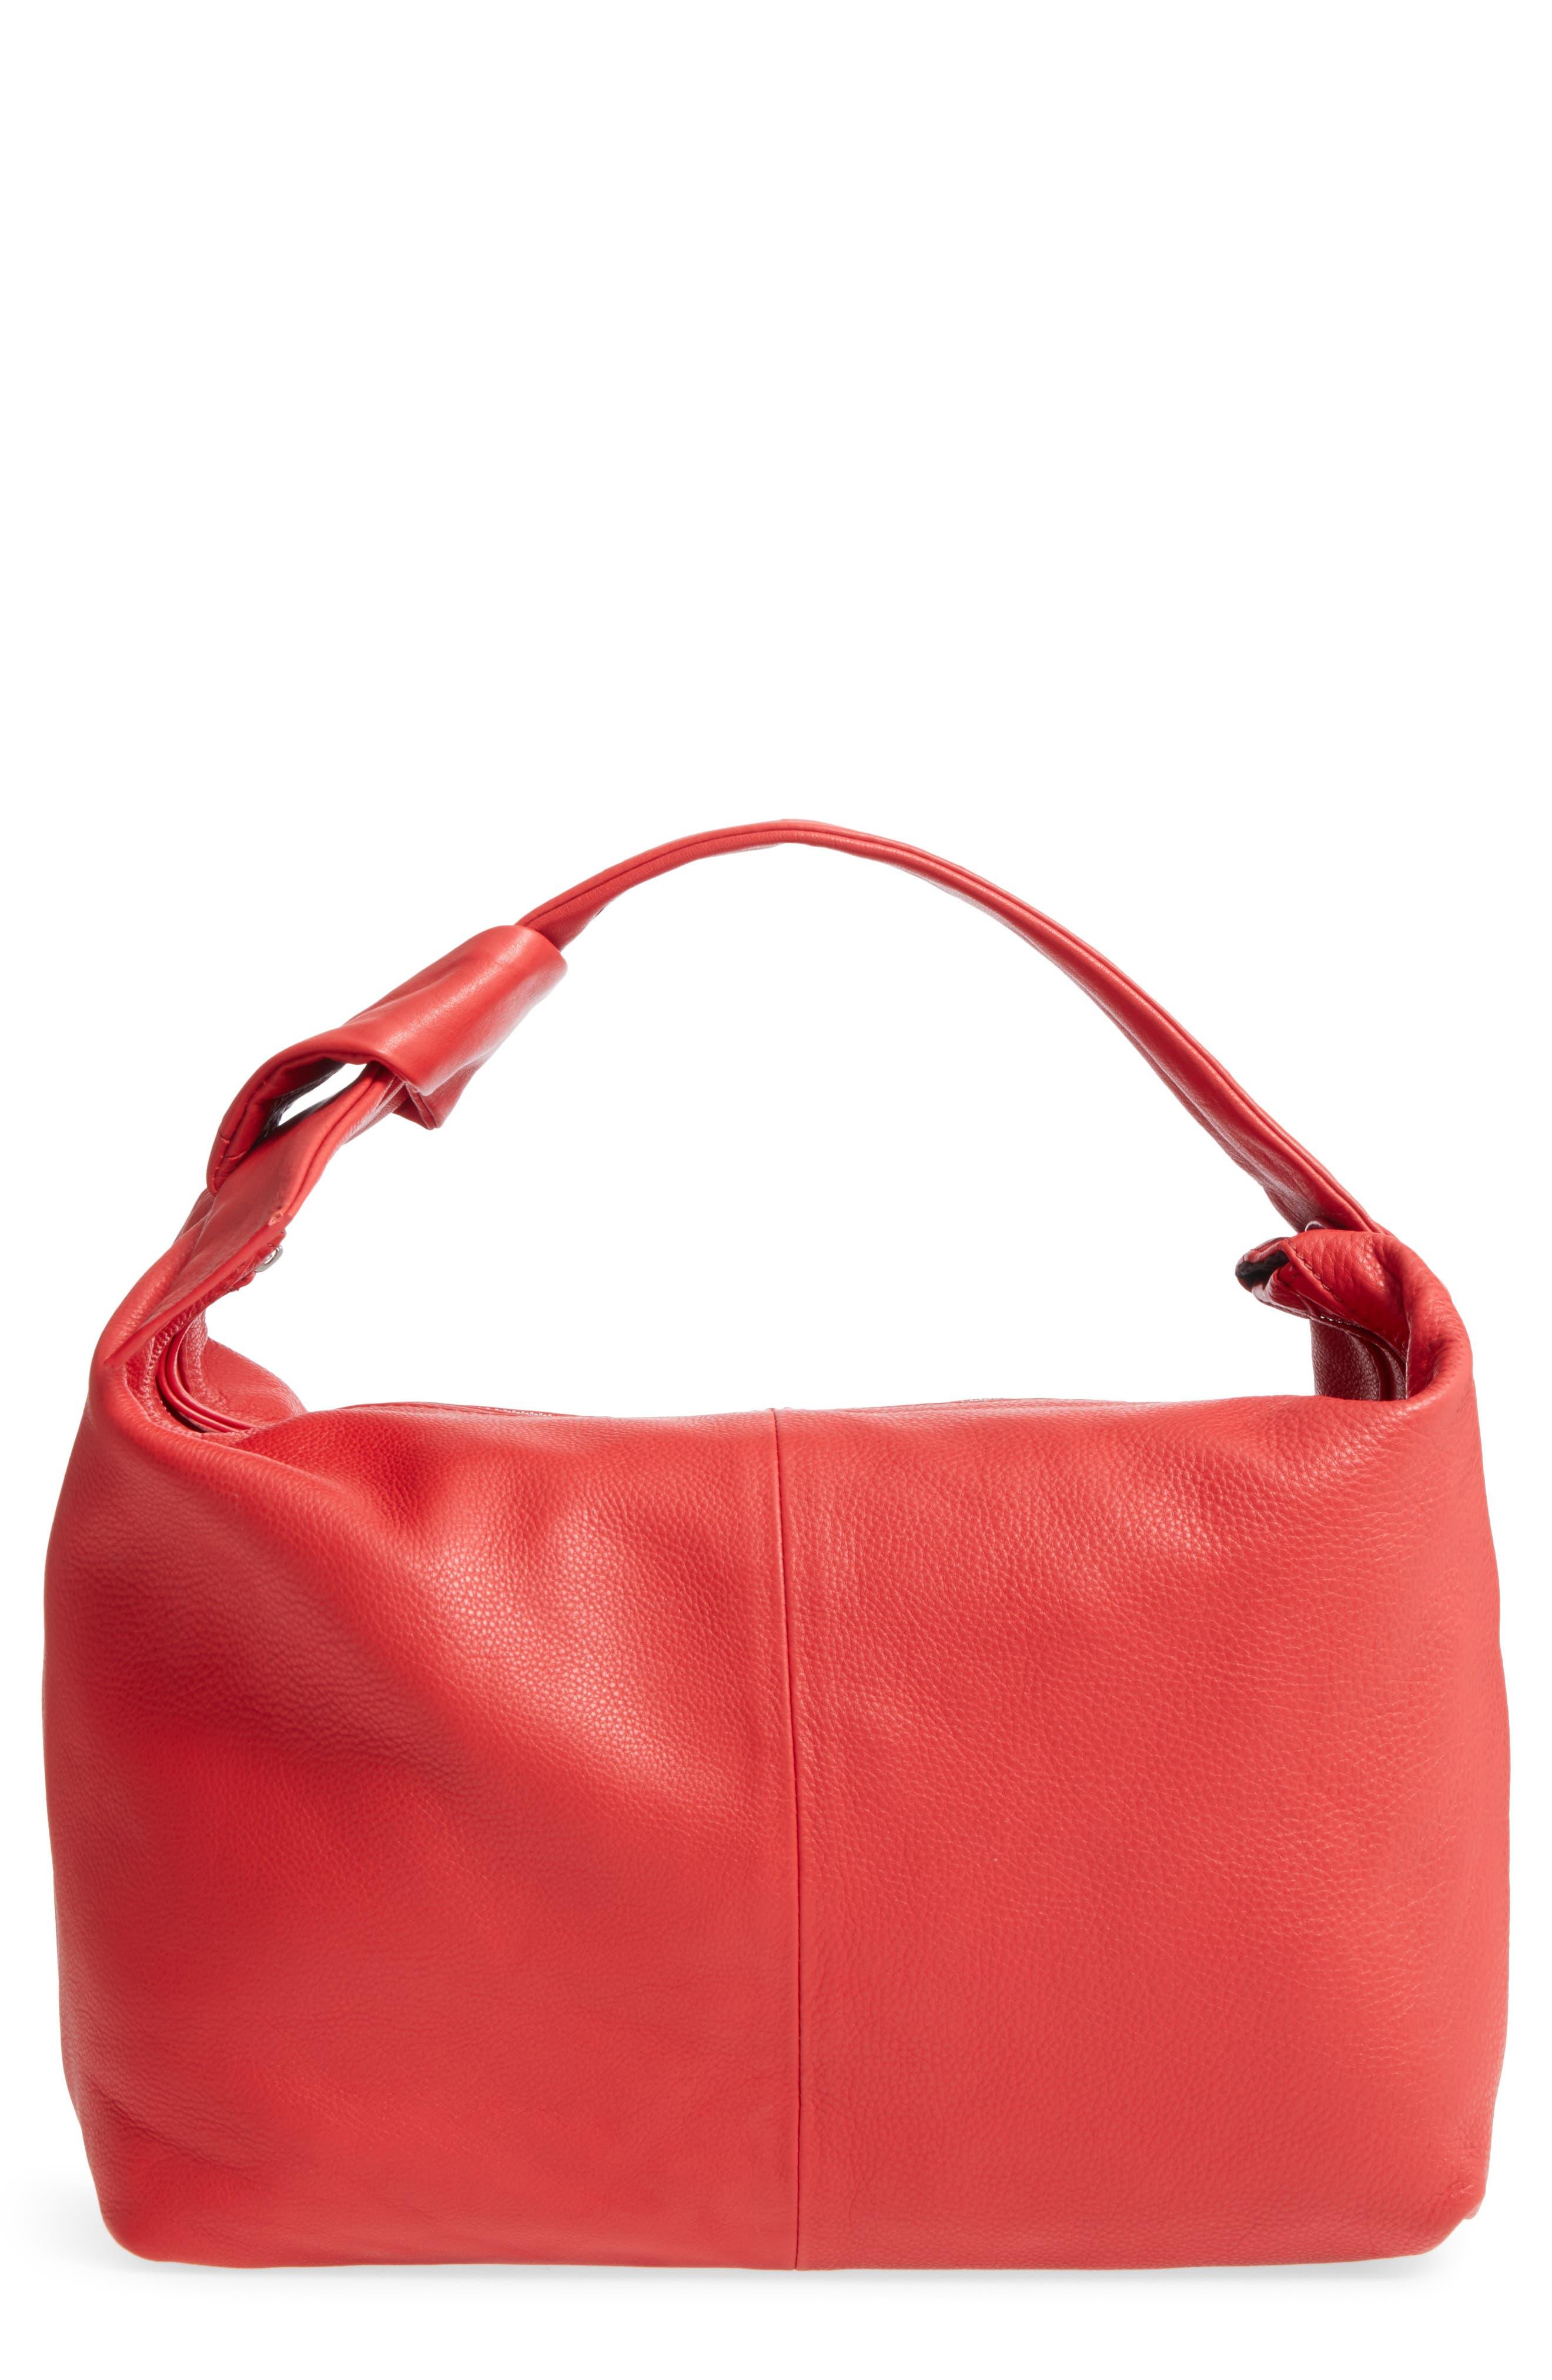 Premium Leather Jasmine Hobo Bag,                             Main thumbnail 1, color,                             Red